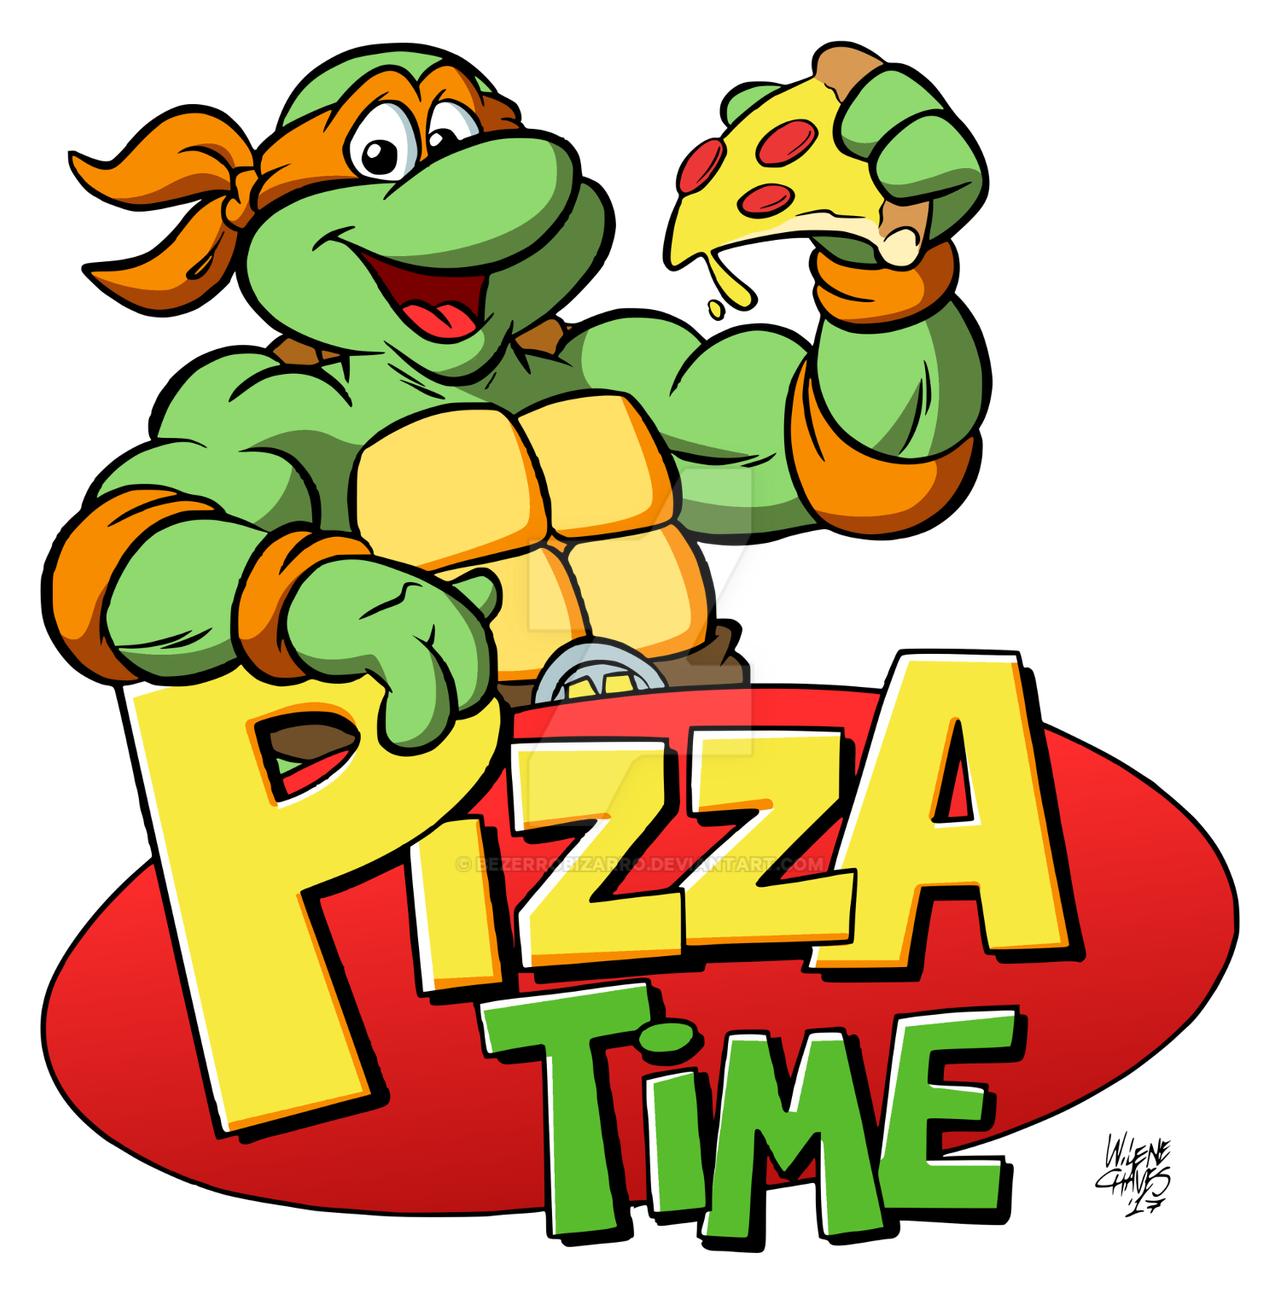 pizza time by bezerrobizarro on deviantart turtle clipart black and white turtles clipart jpg file